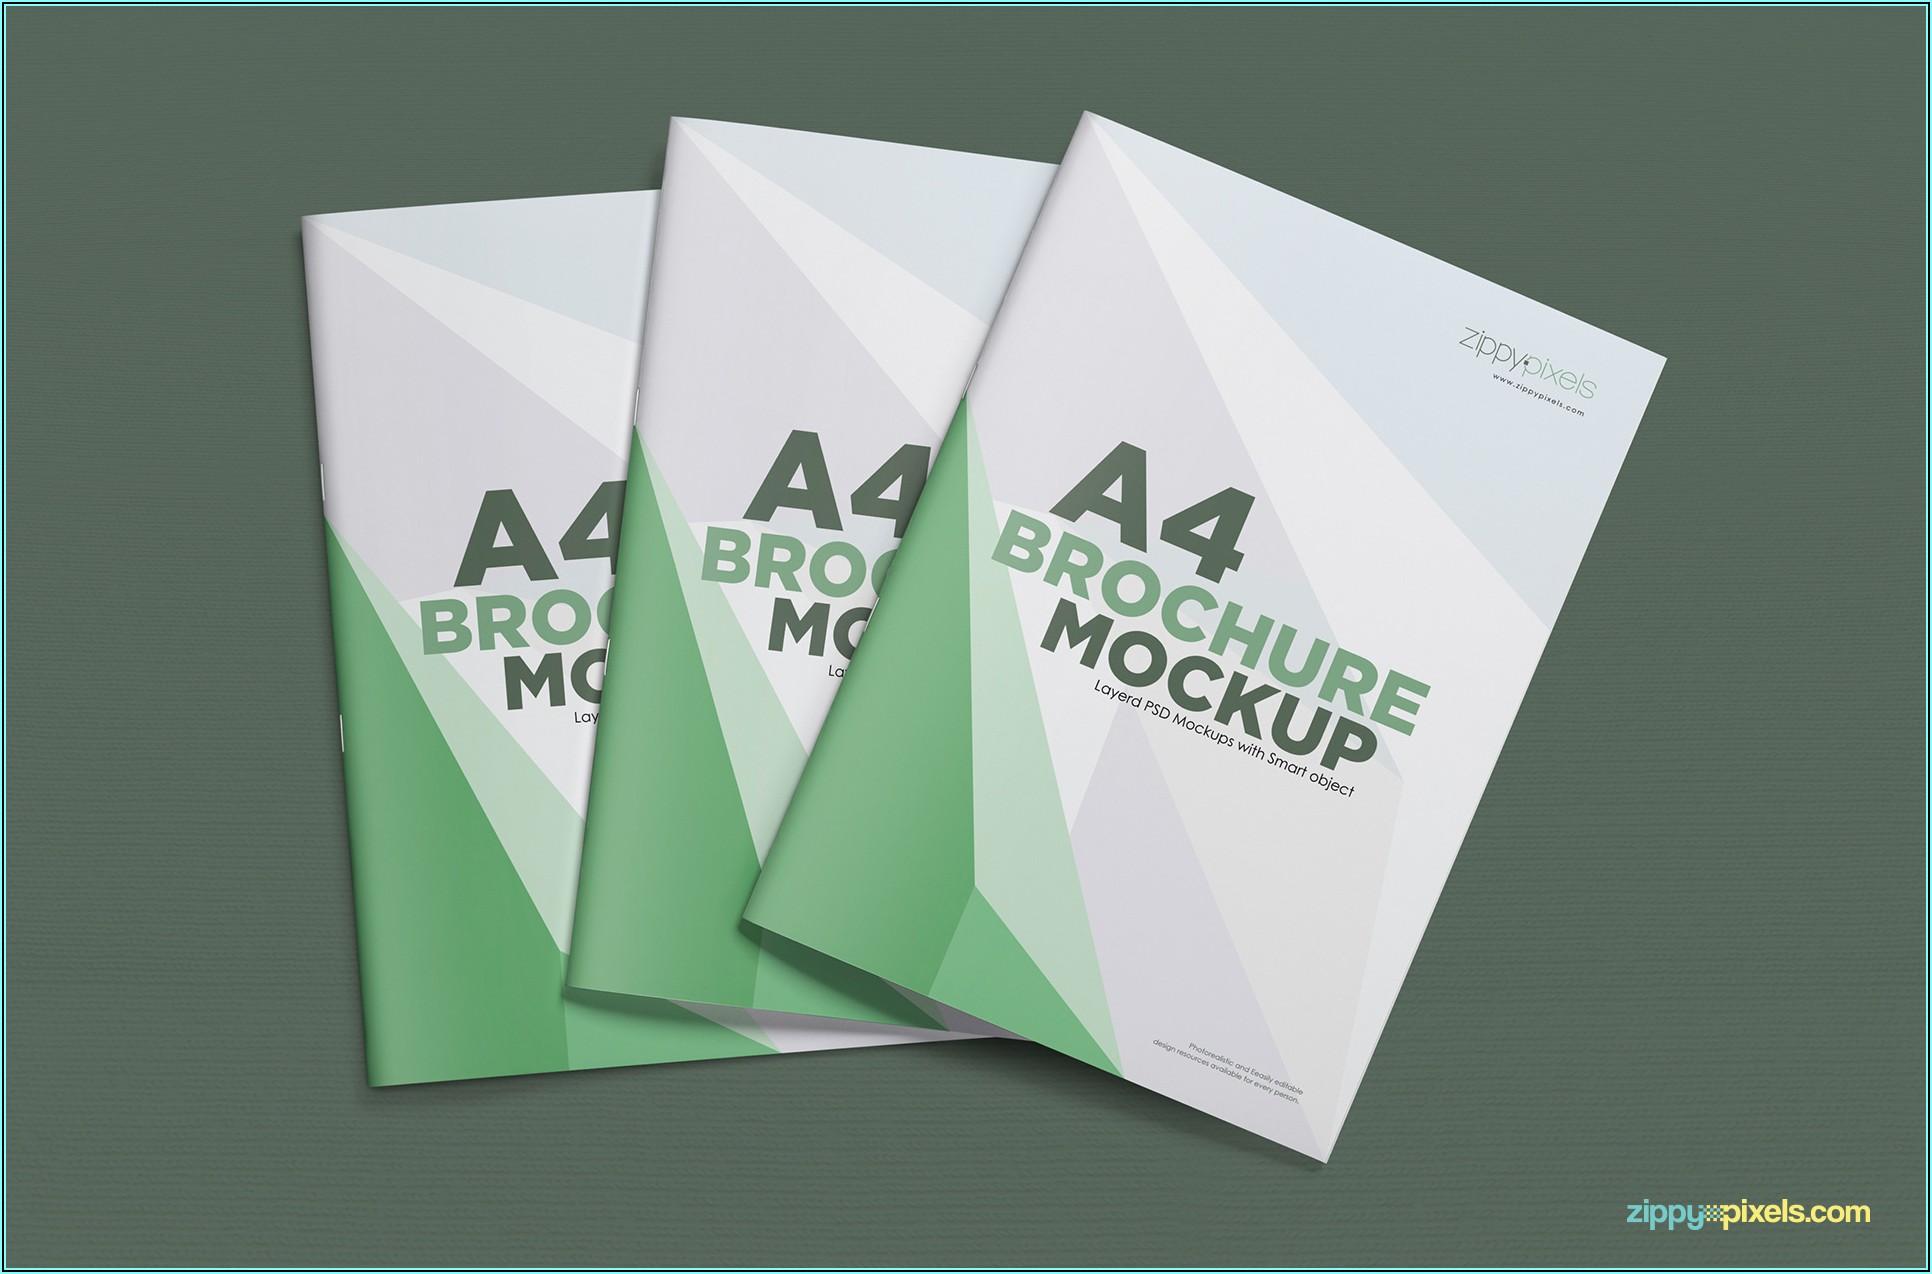 Brochure Mockup A4